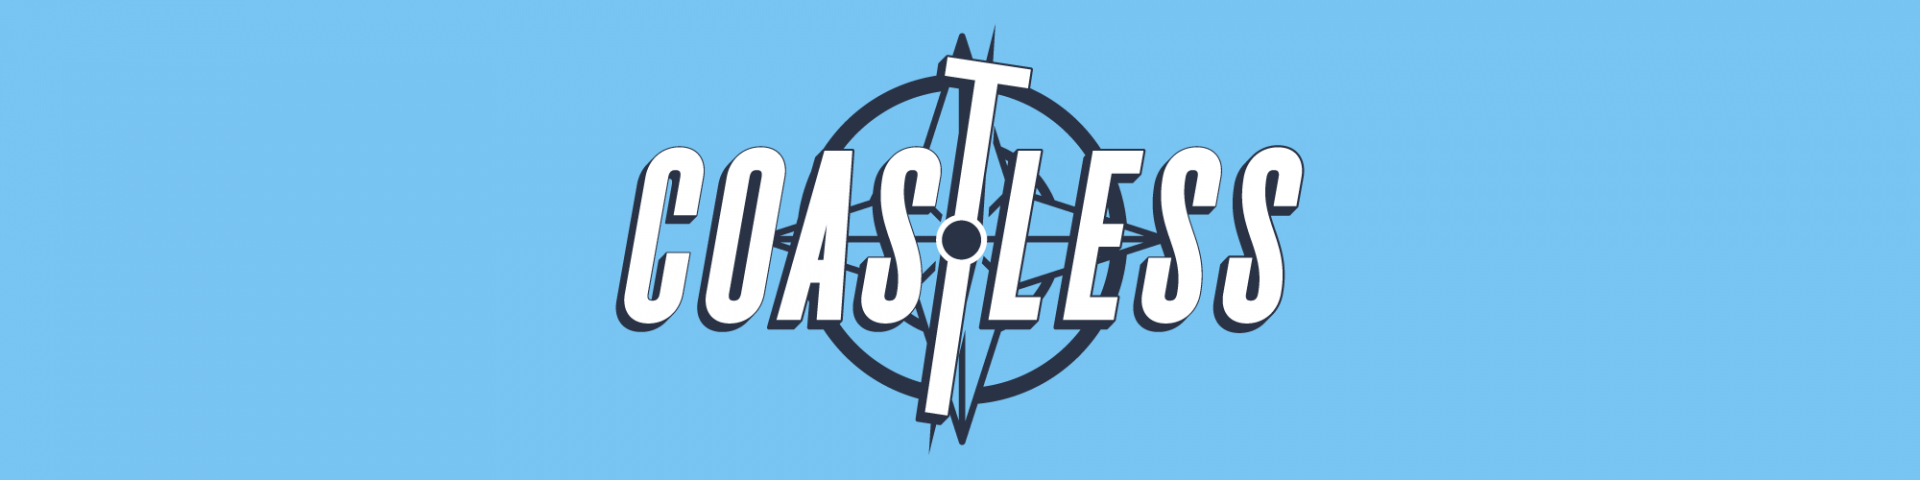 Coastless